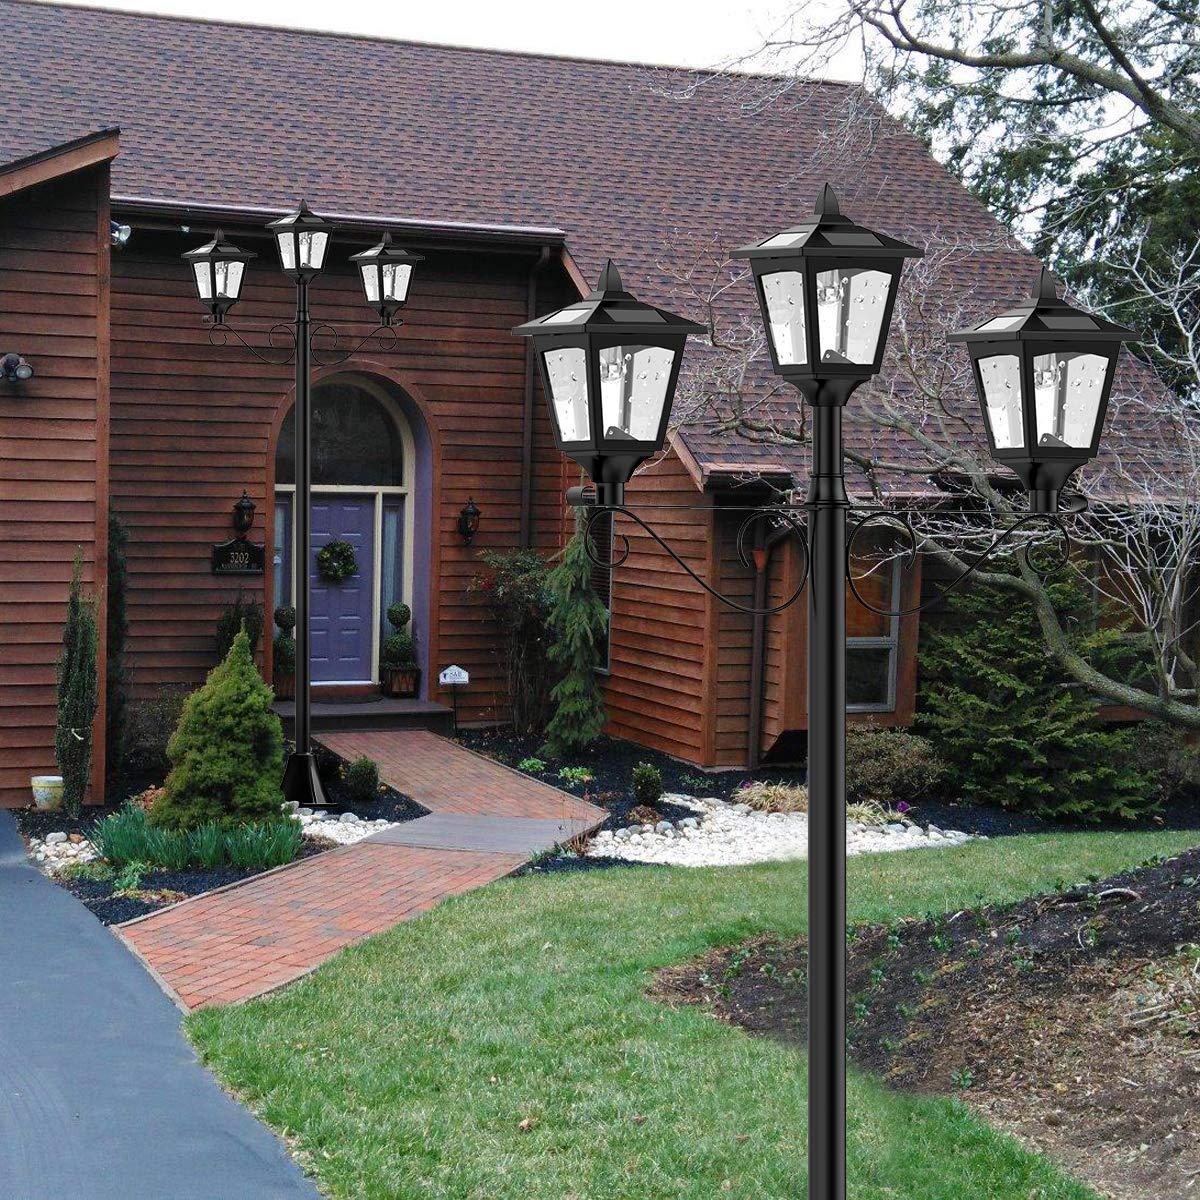 "72"" Solar Lamp Post Lights Outdoor, Triple-Head Street Vintage Solar Lamp Outdoor, Solar Post Light for Garden, Lawn, Planter Not Included"